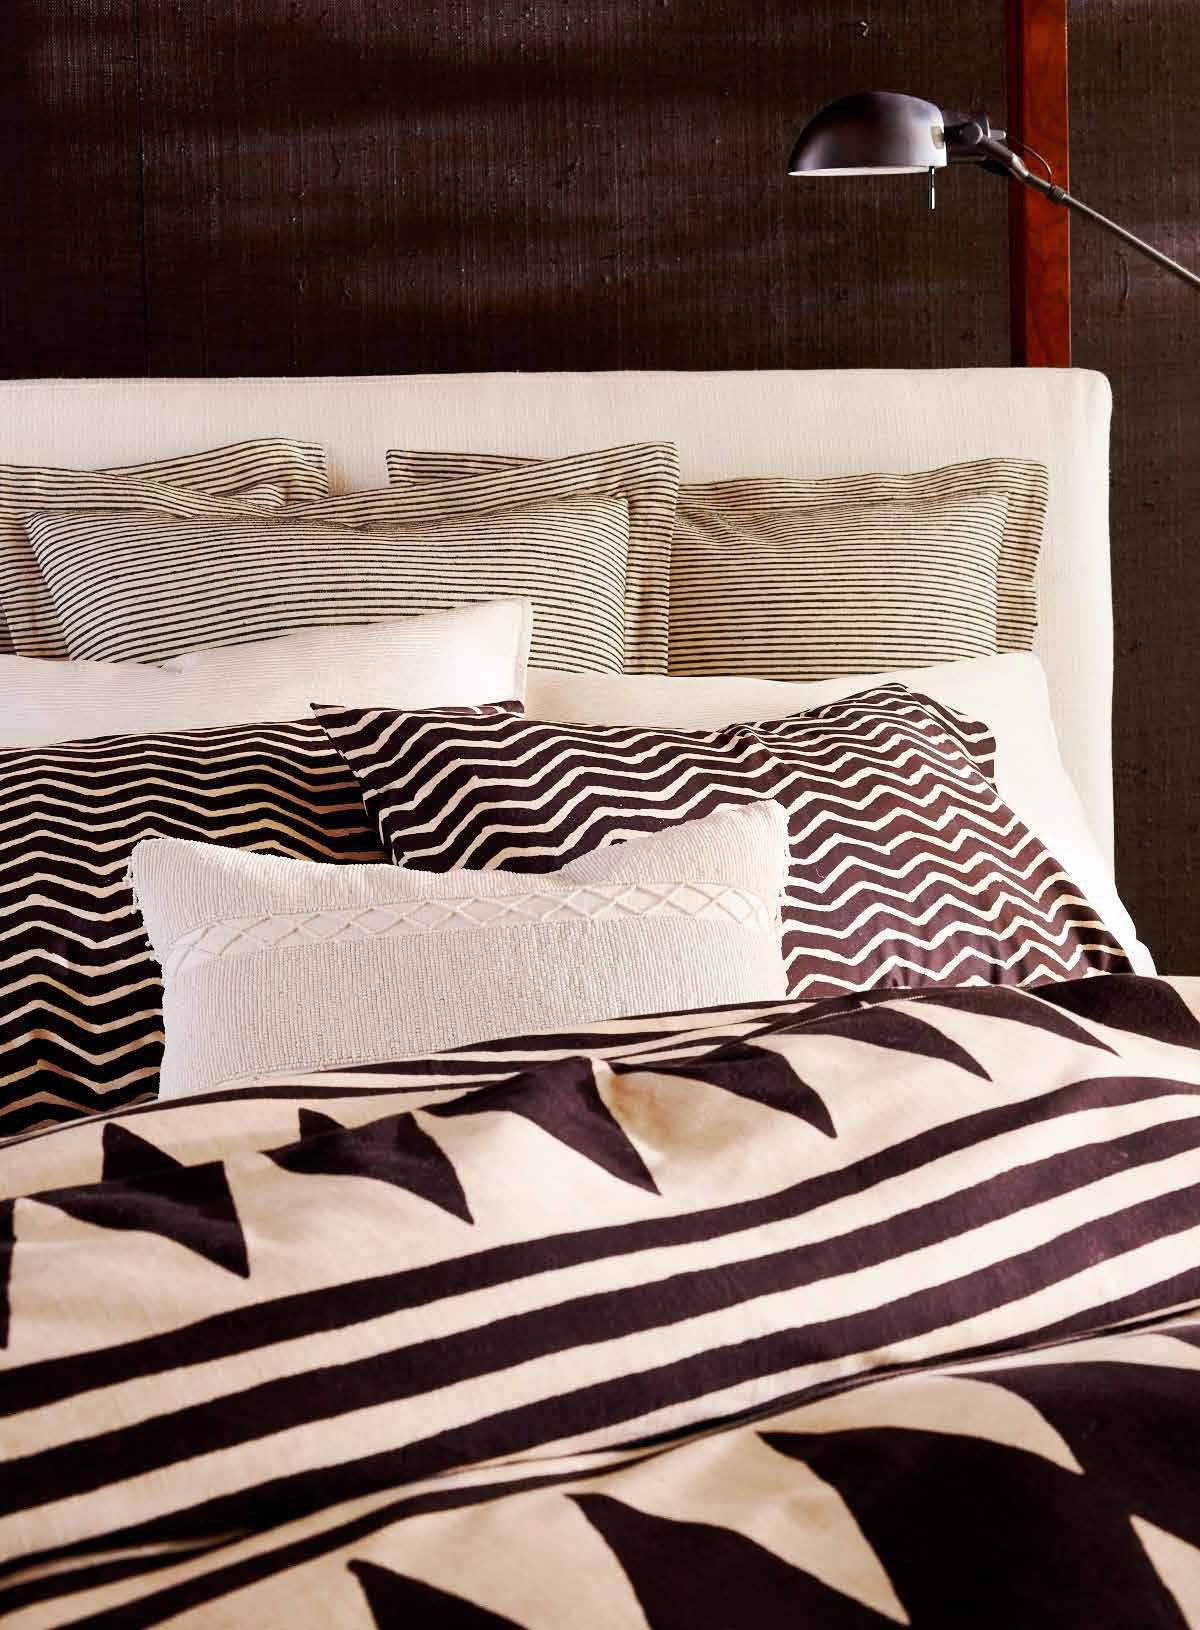 Ralph lauren plaid bedding - Ralph Lauren Home S Graphic Black Palms Bedding Collection